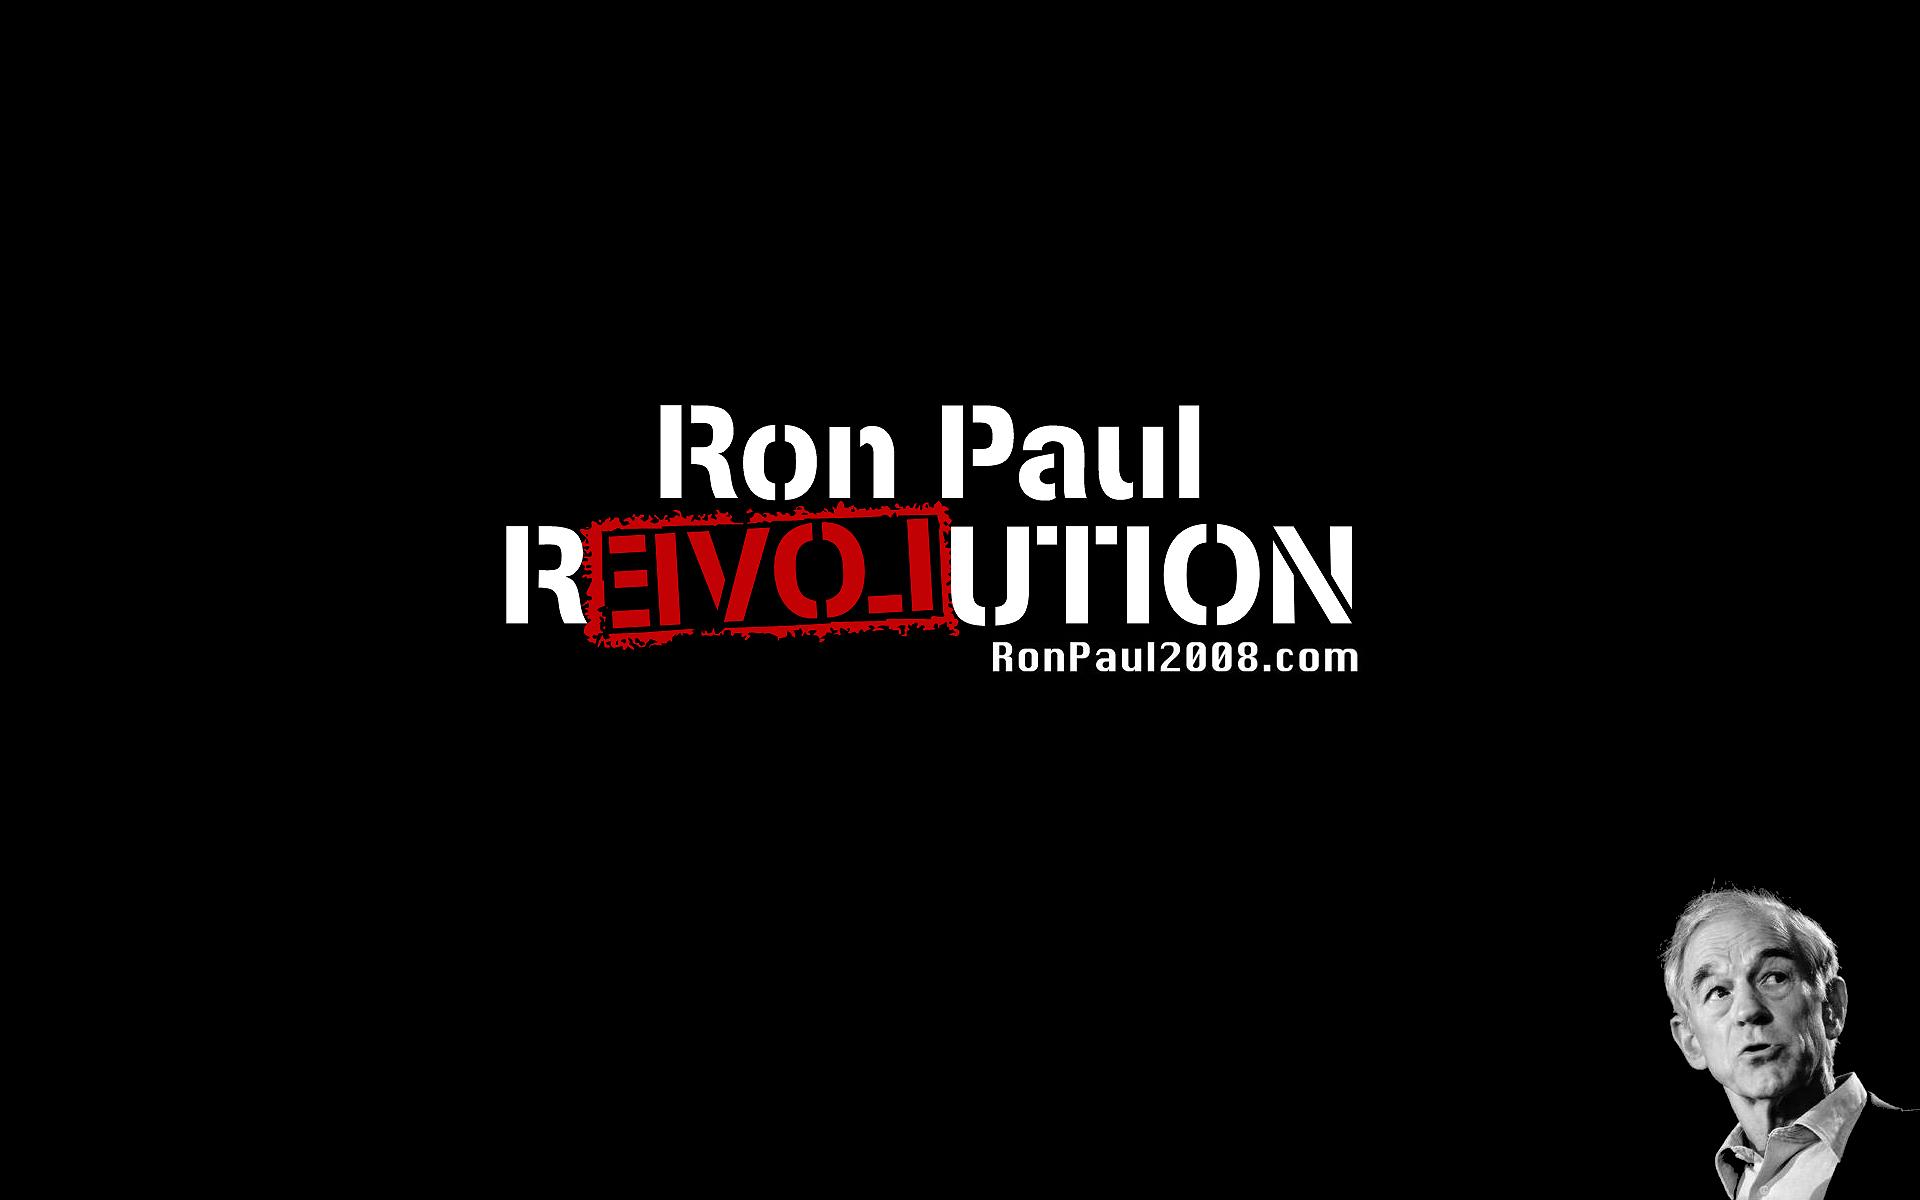 Ron Paul 2008 by LegacyCX